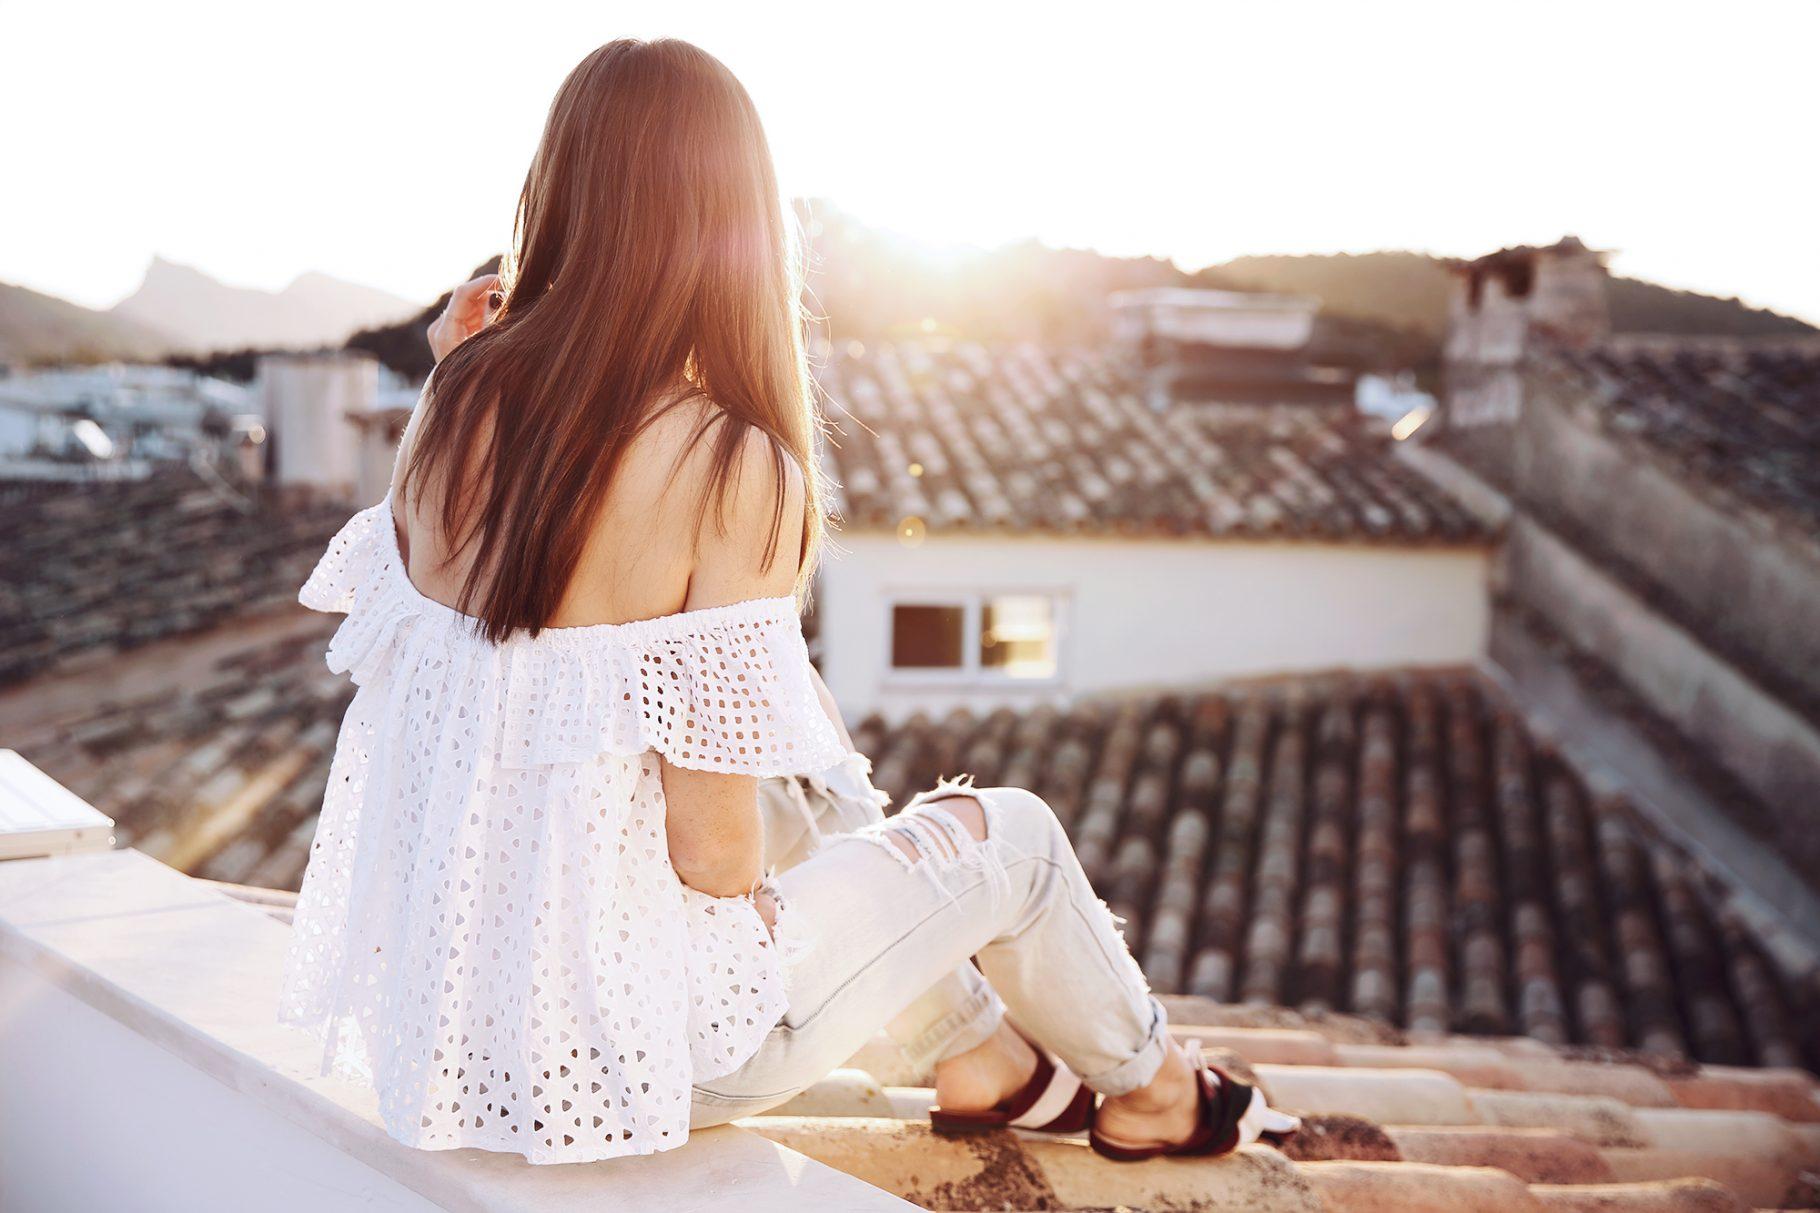 BEAUTY: sun exposure & protection